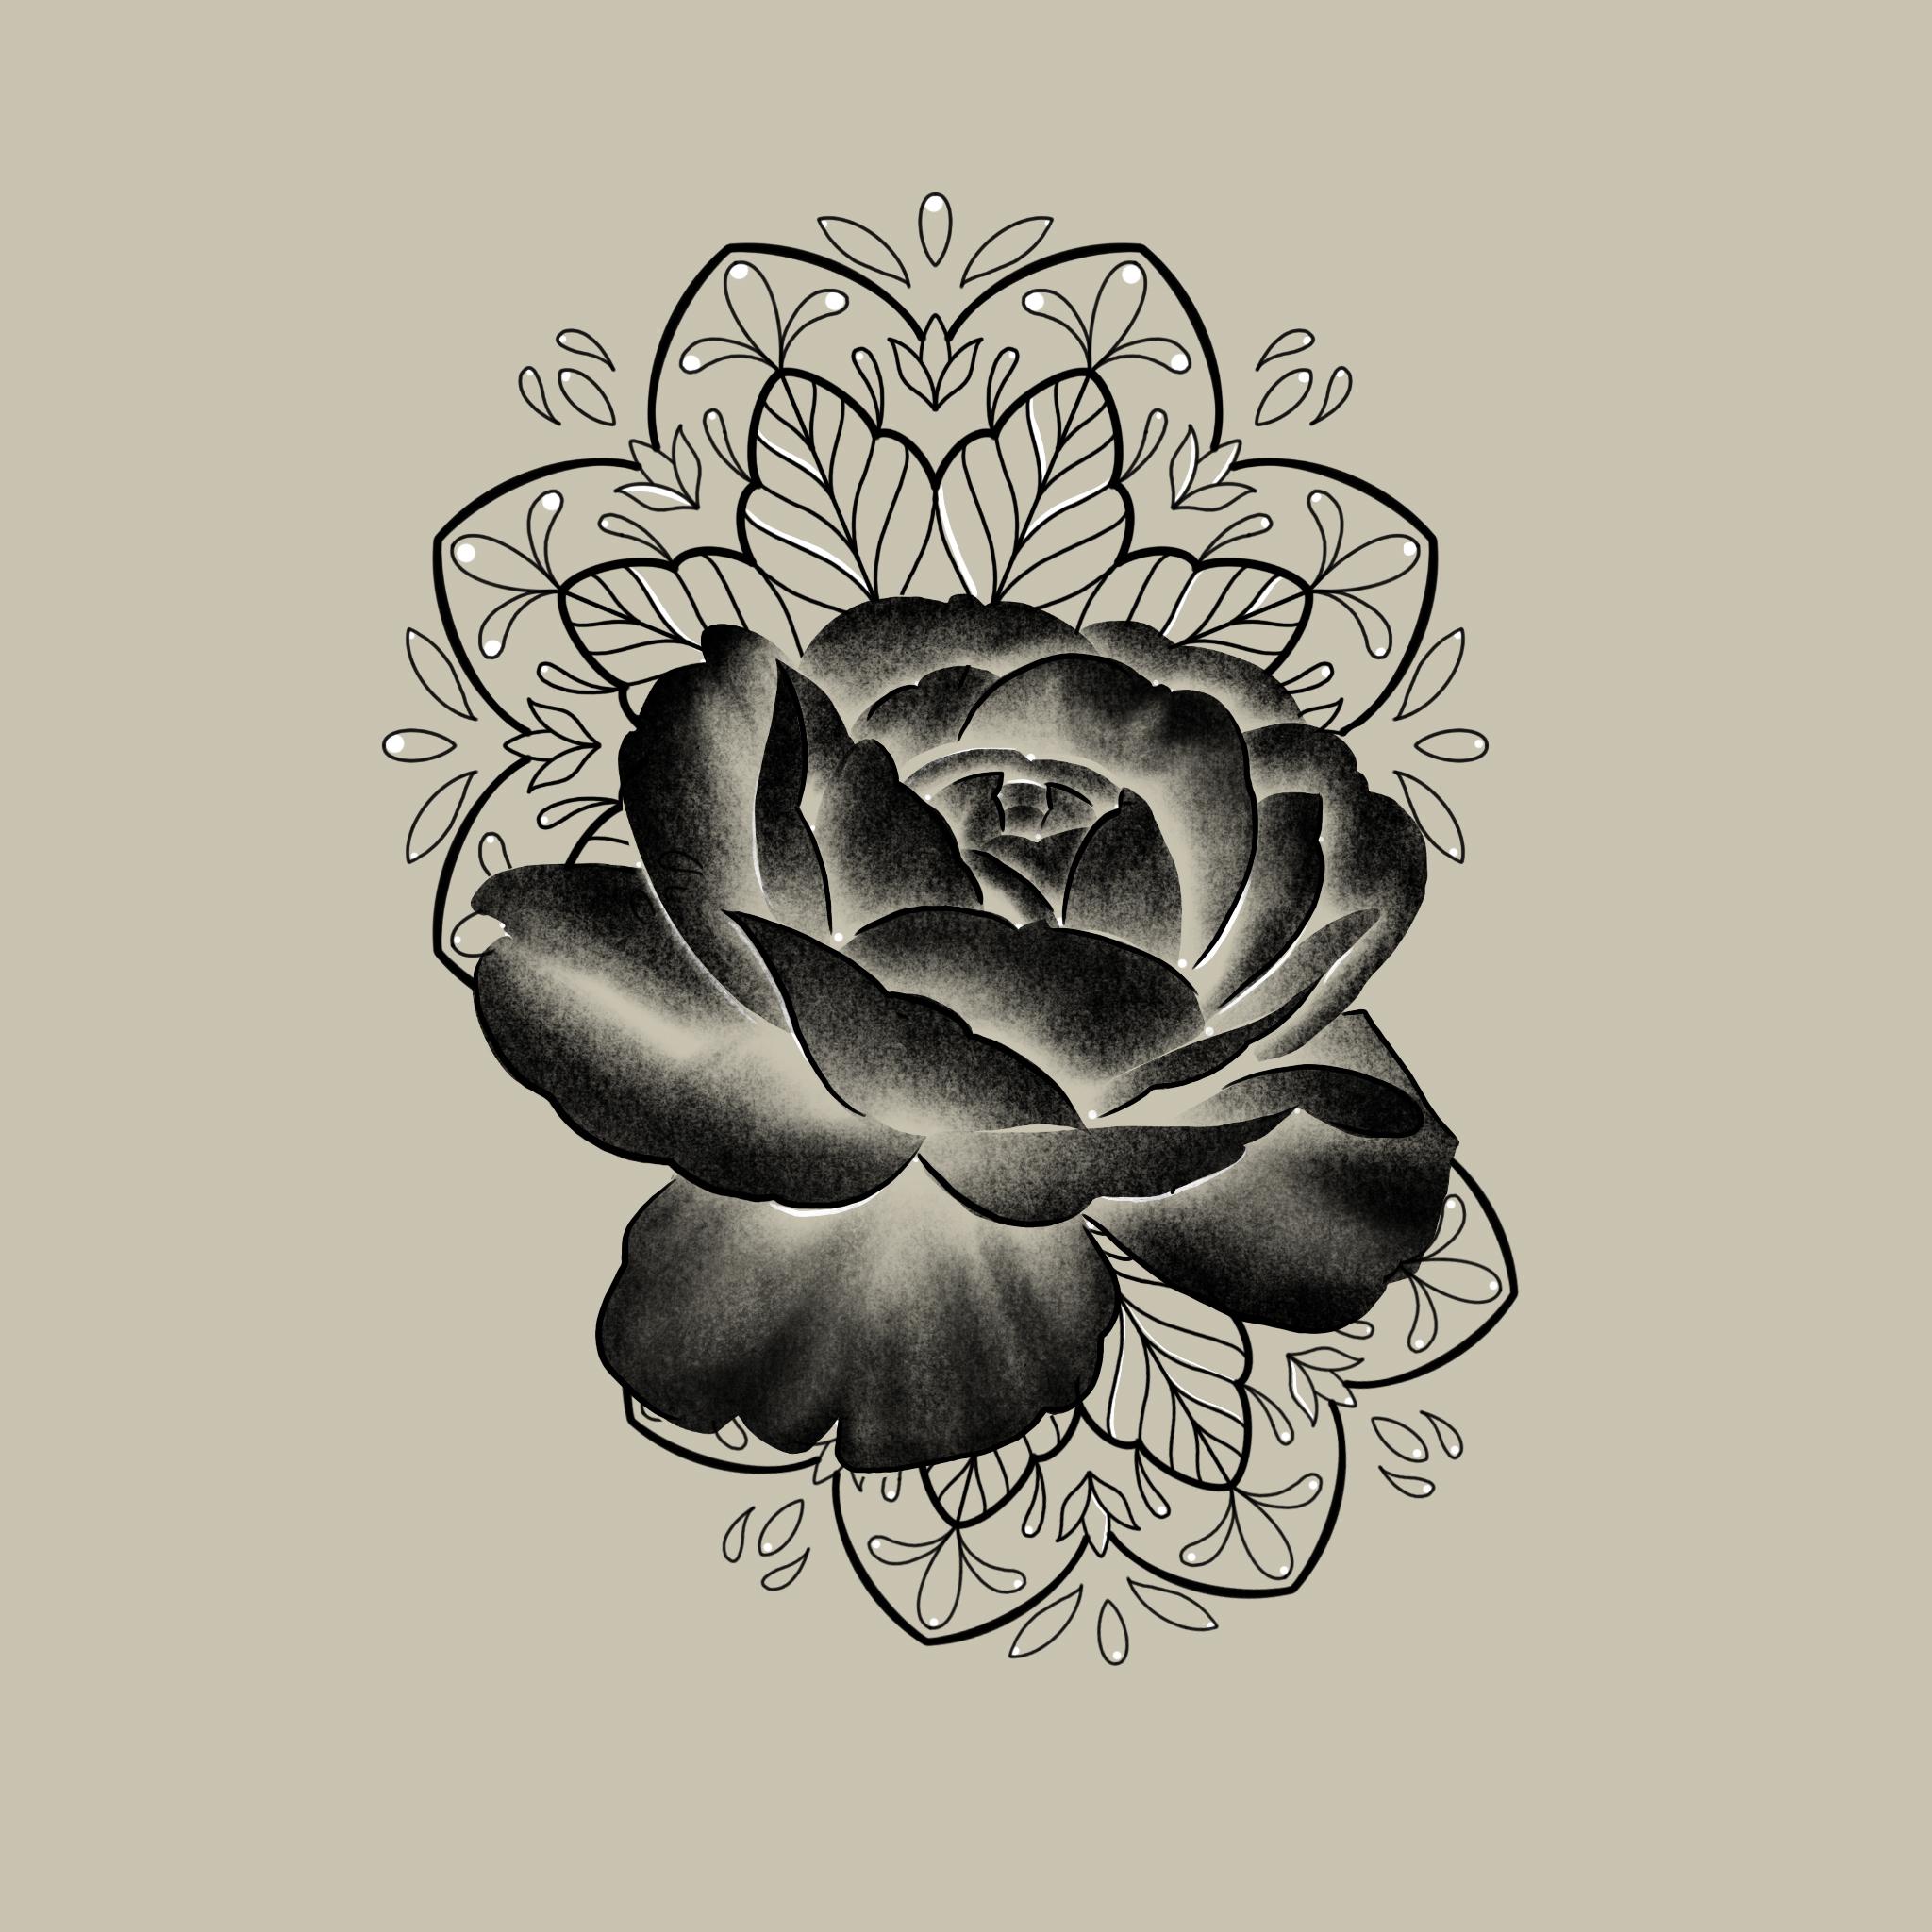 Inksearch tattoo Alwa